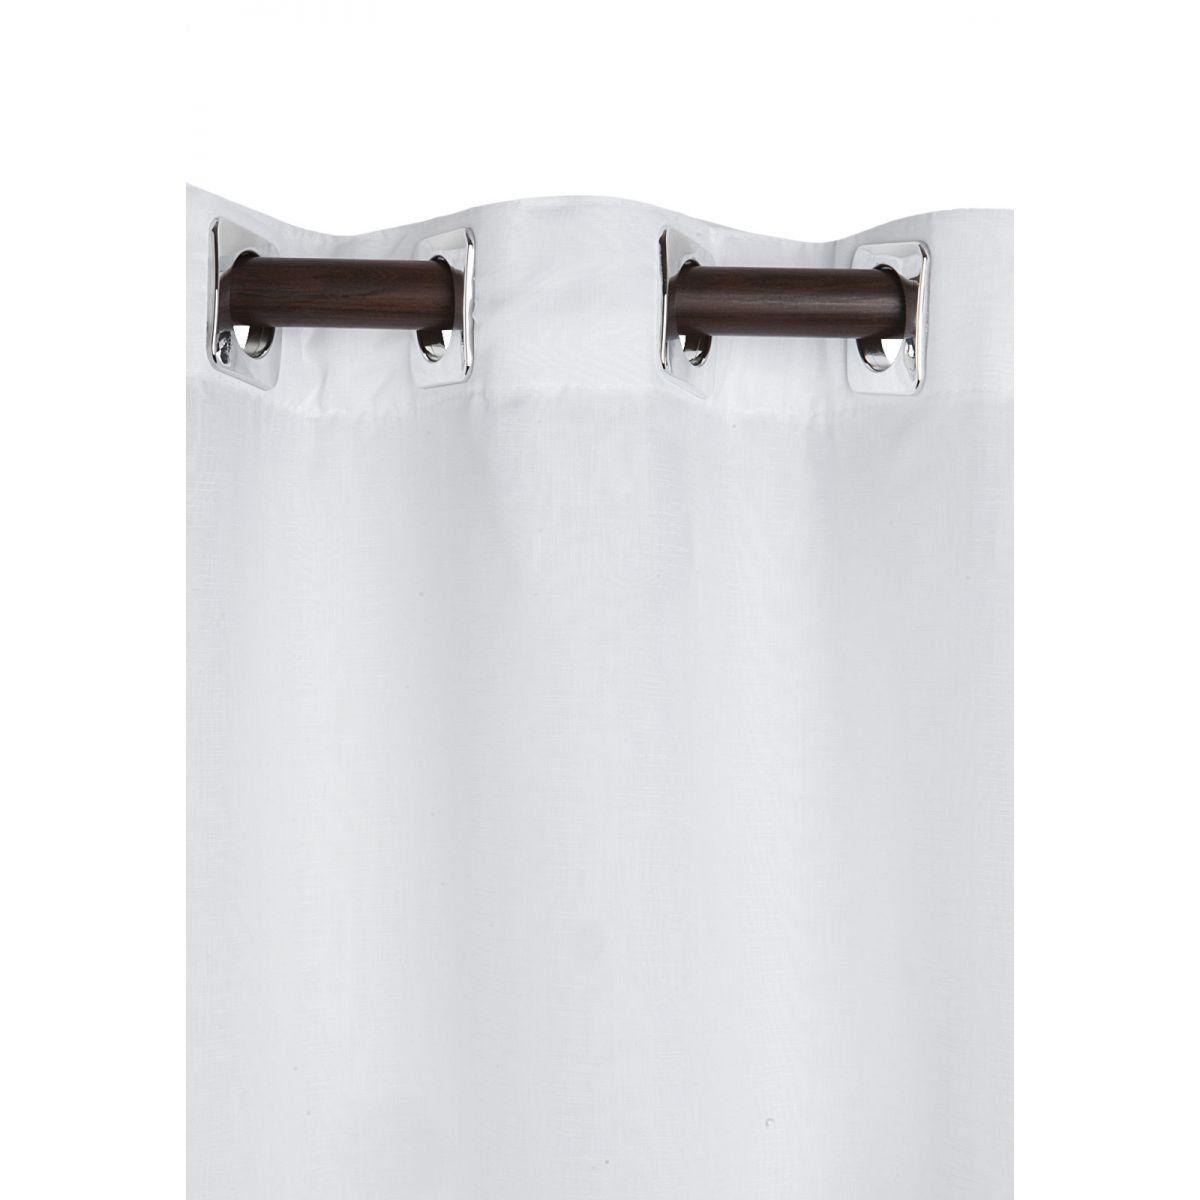 Cortina Blackout De Tecido Quarto/Sala 3,00x2,50 Branca  Admirare